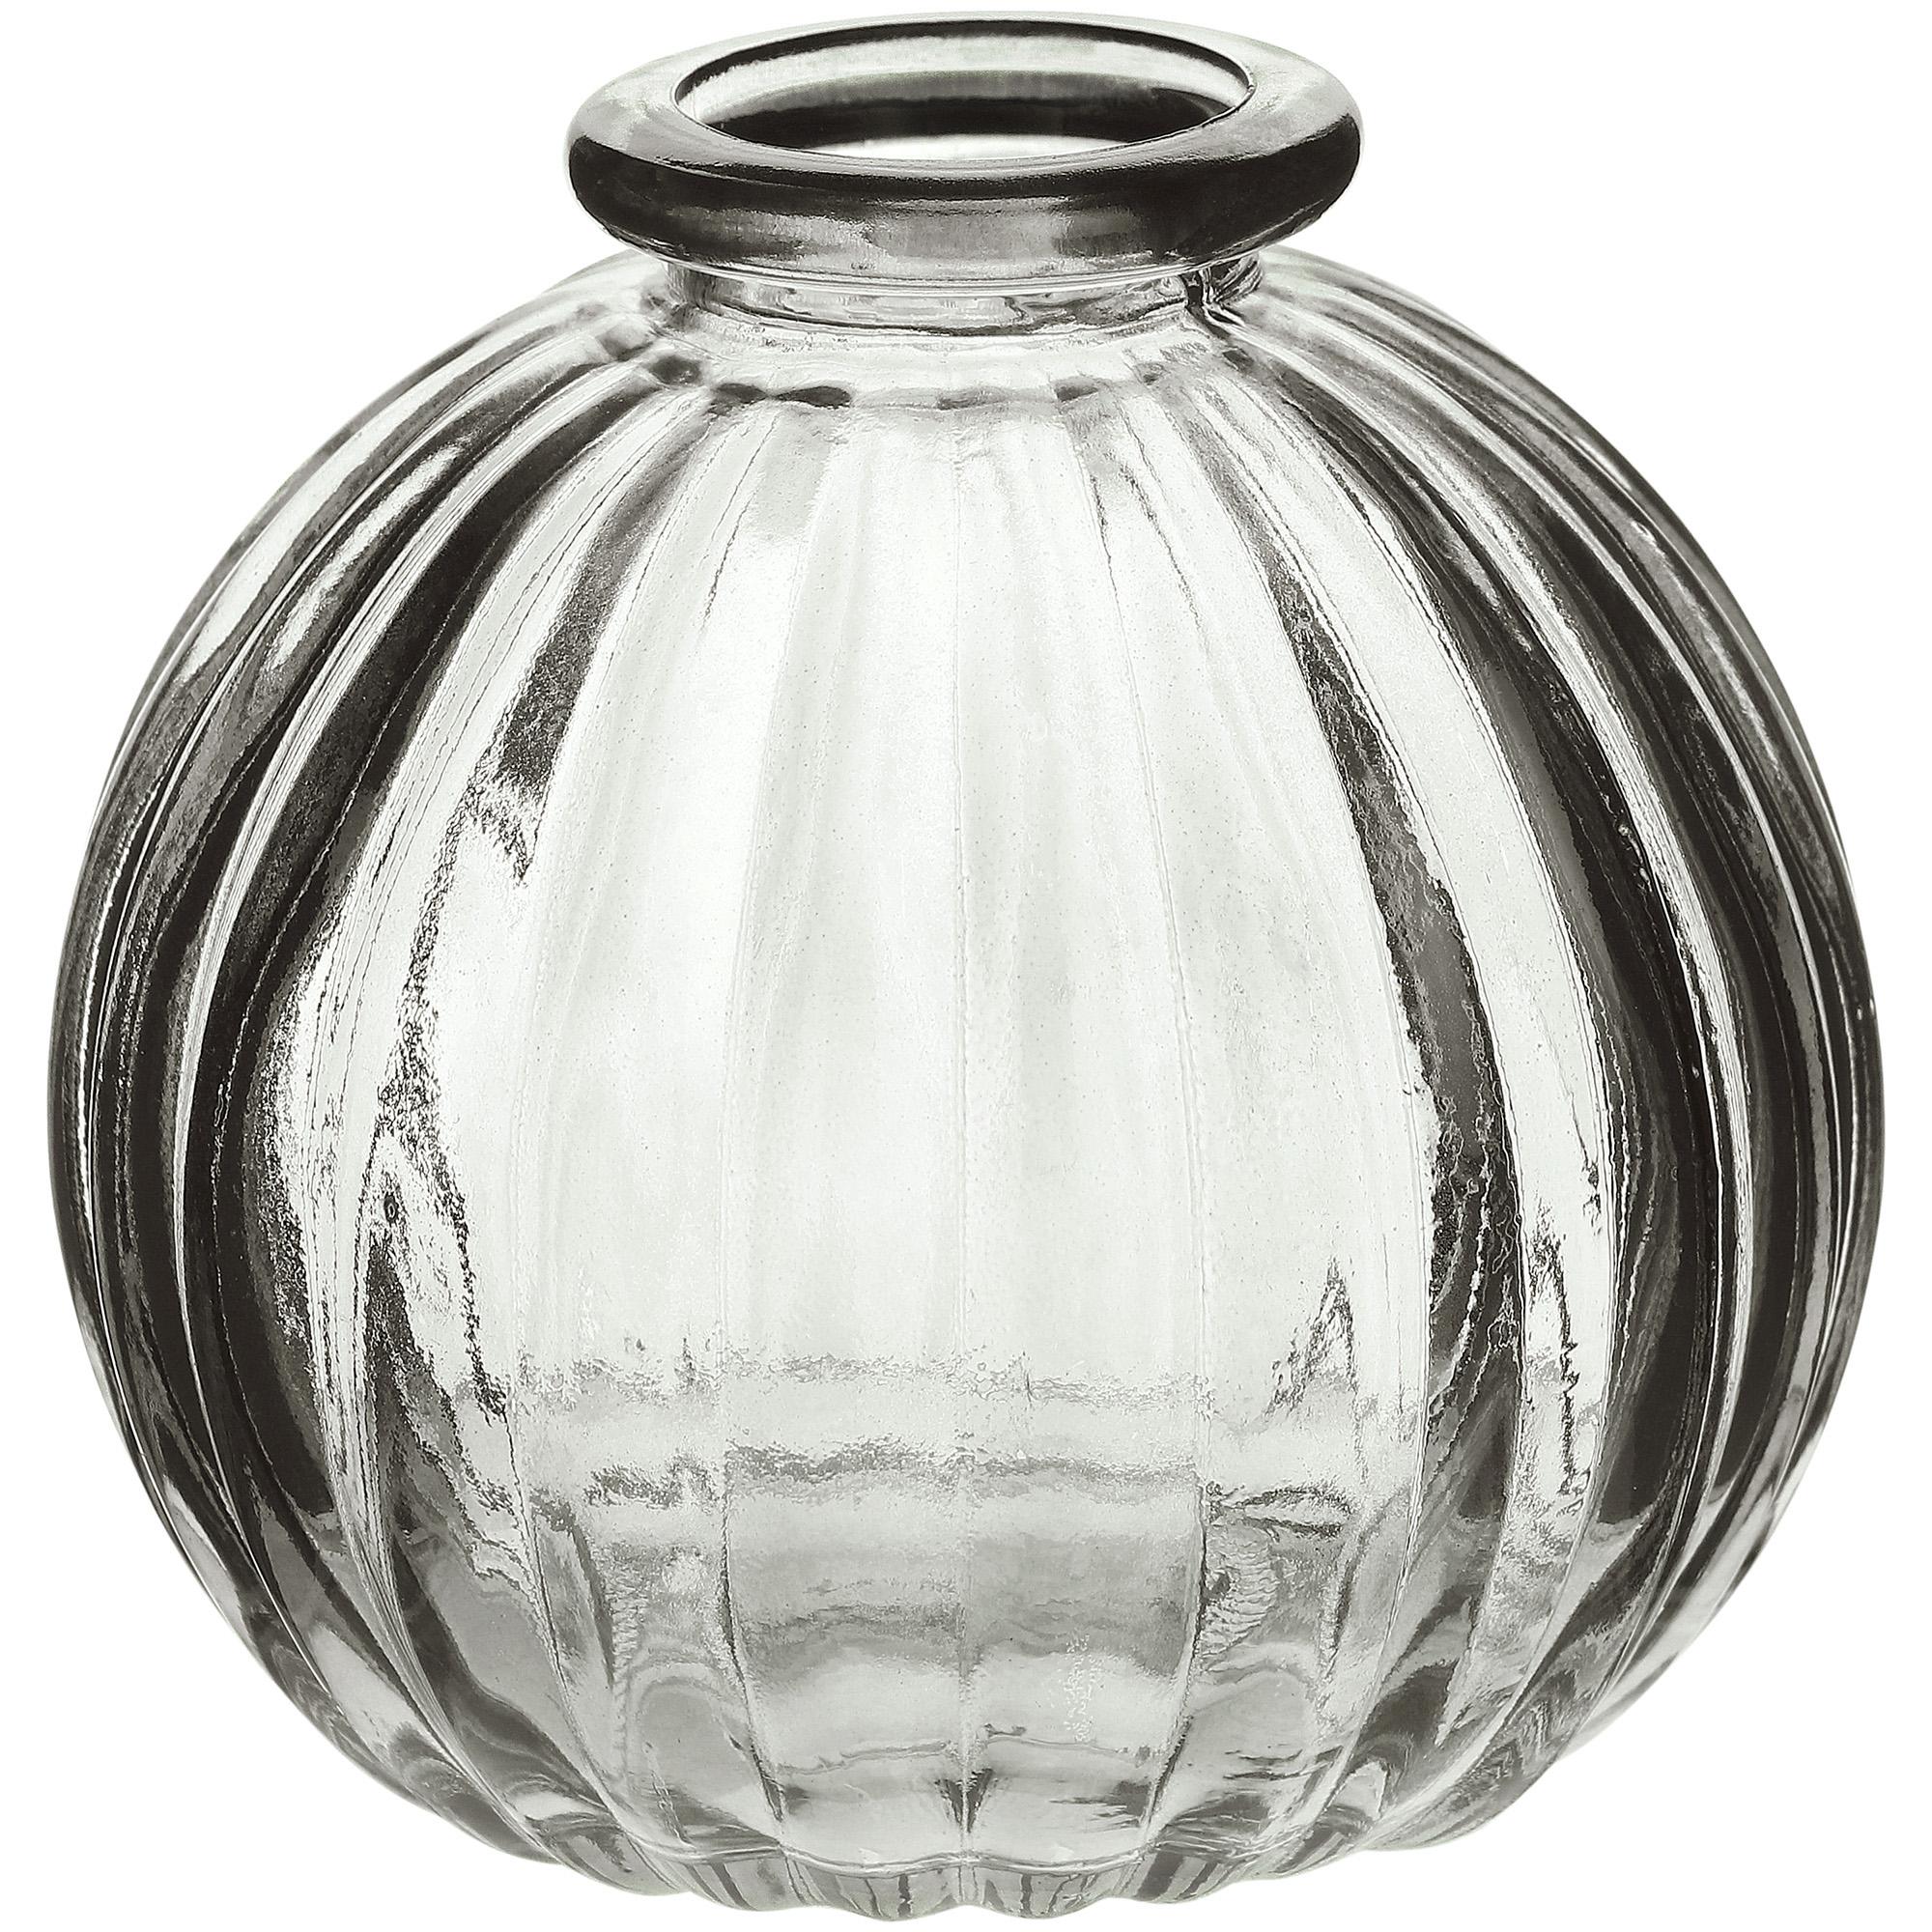 Ваза стеклянная Hakbijl Glass Mini Vase серая 8,5х8 см